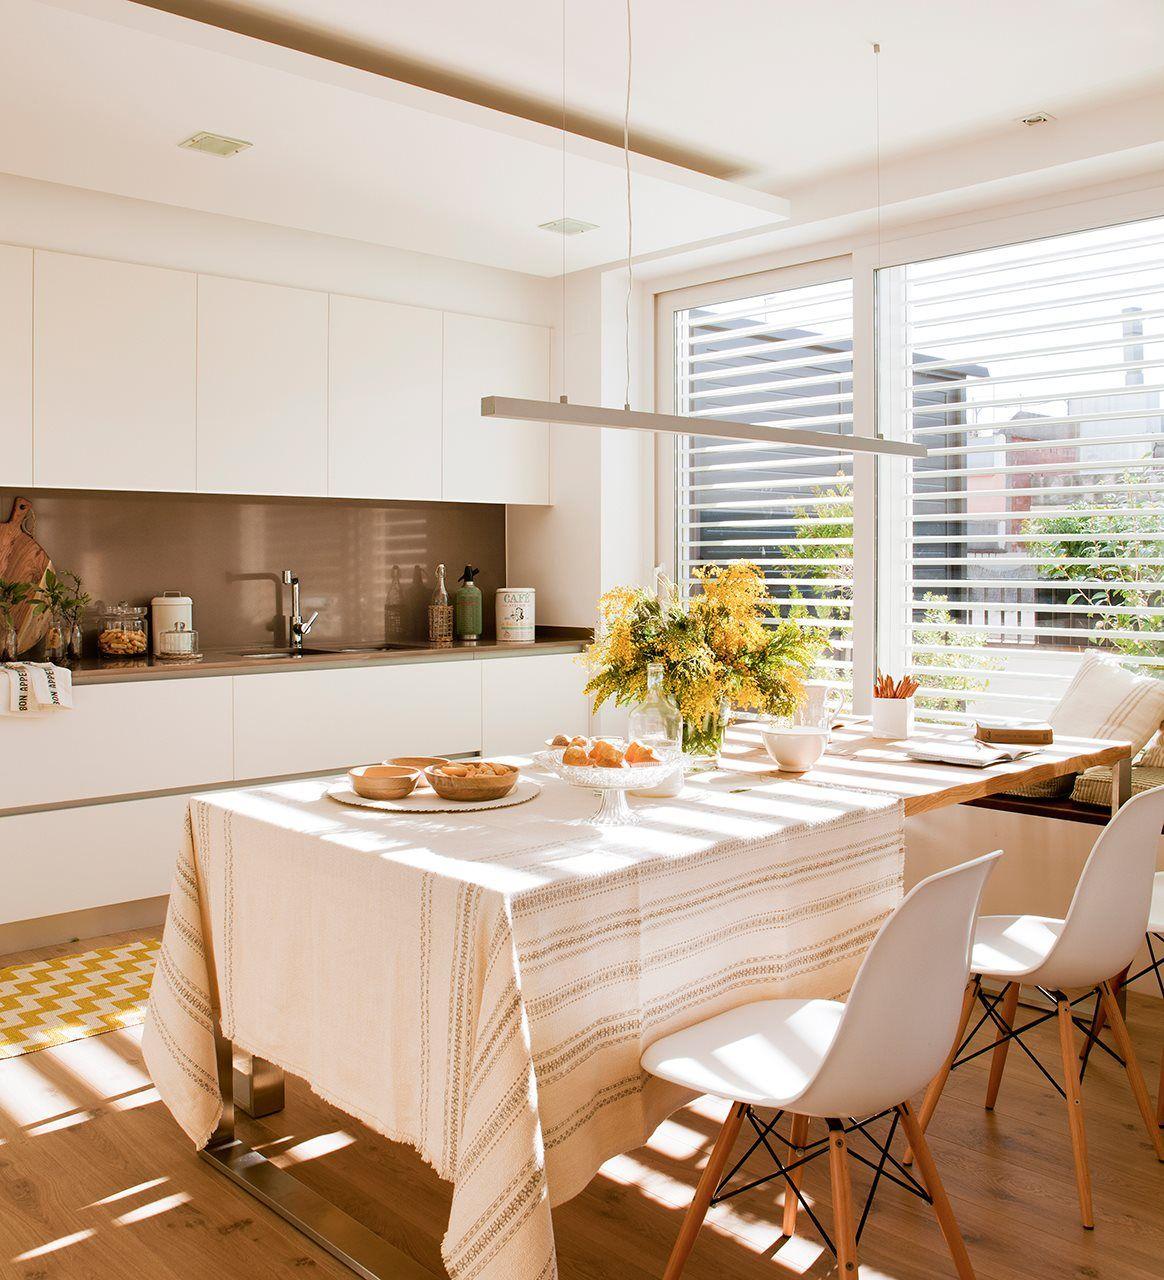 Un piso urbano de solo 65 metros | ideas casa | Pinterest | Cocinas ...